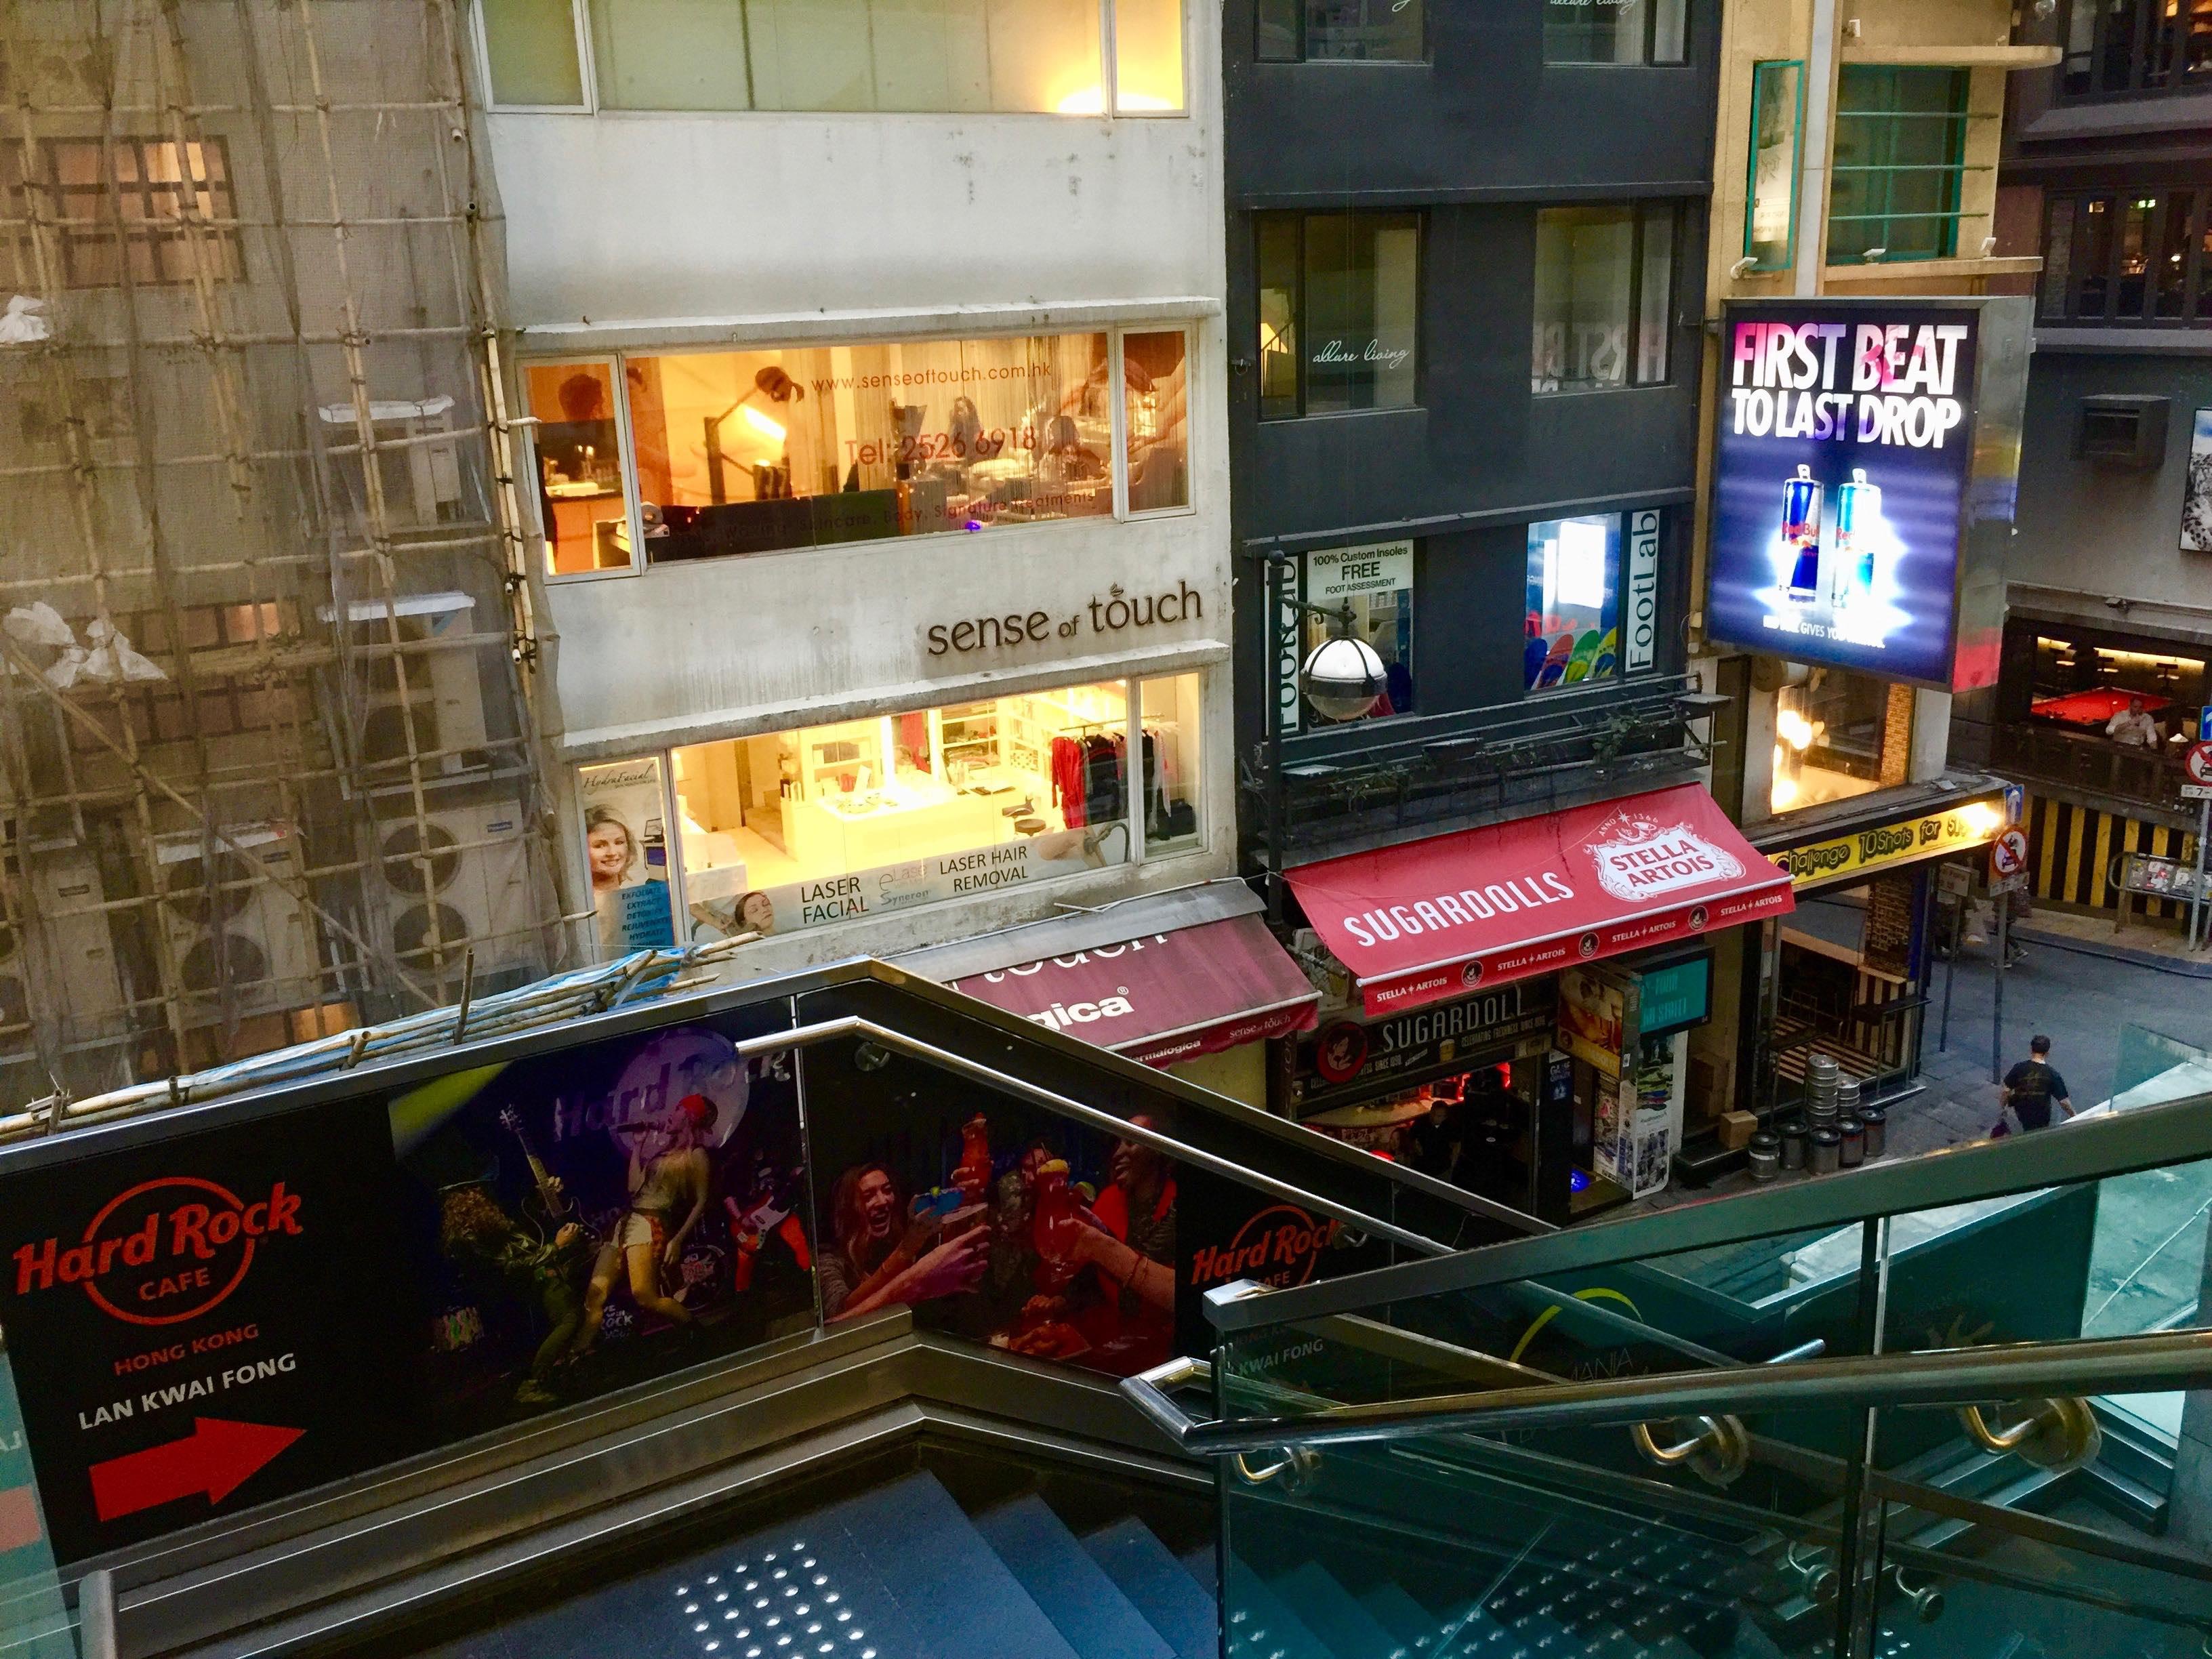 Hong Kong Central F&B Shop for Rent in Lan Kwai Fong